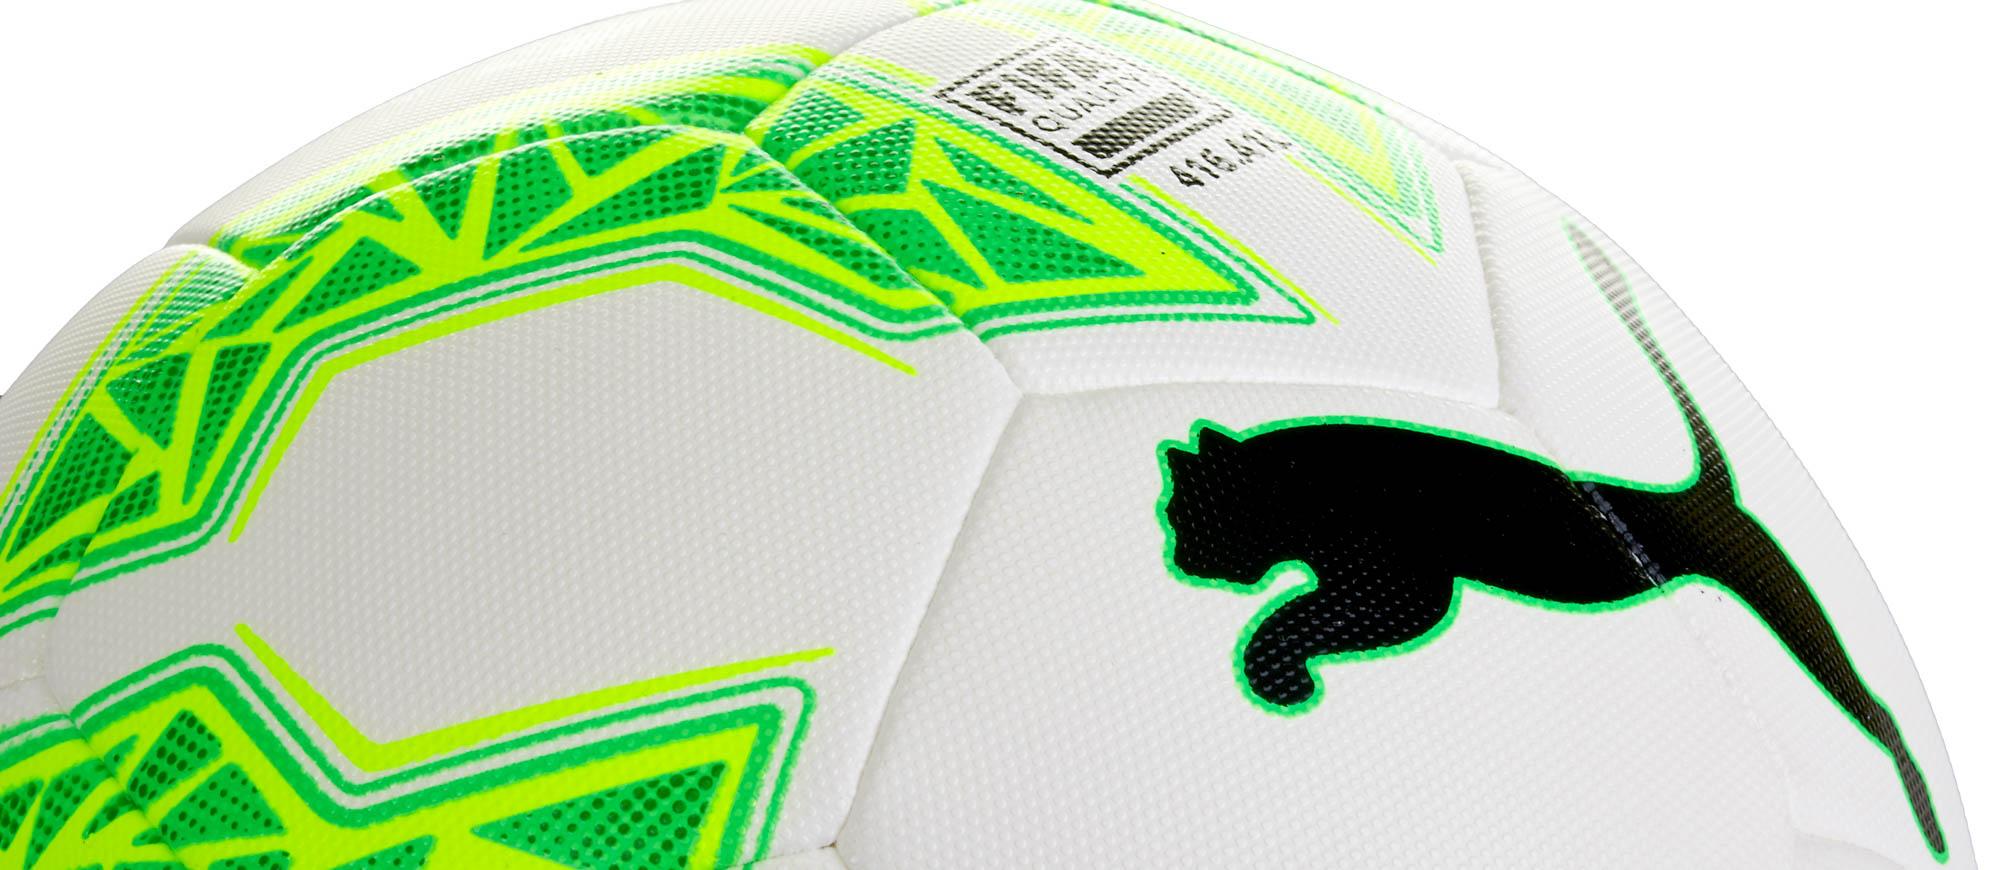 Puma evoSPEED 2.5 Hybrid Soccer Ball